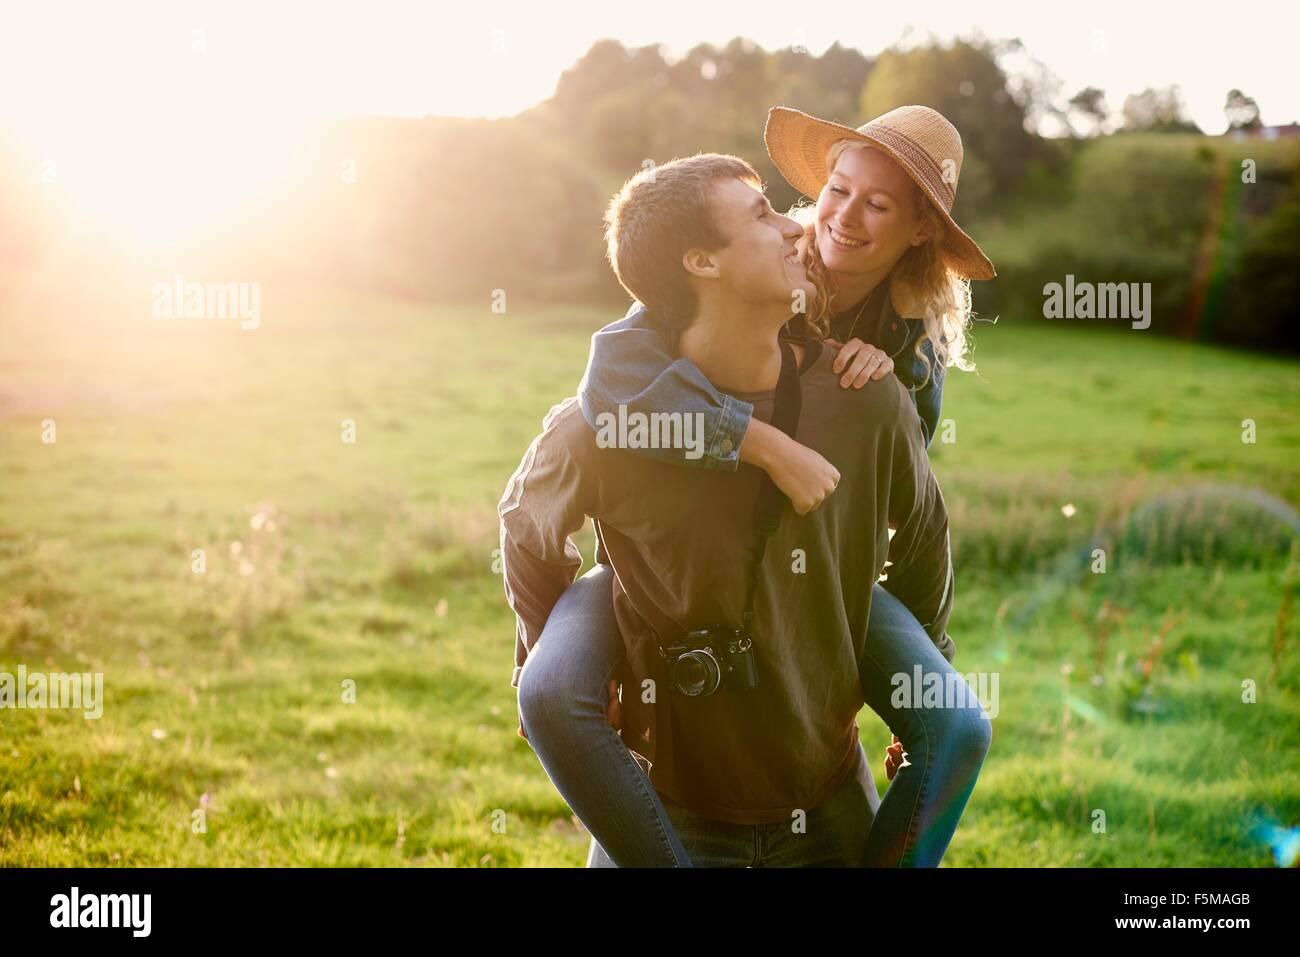 Young man giving girlfriend piggyback un in rural field Photo Stock